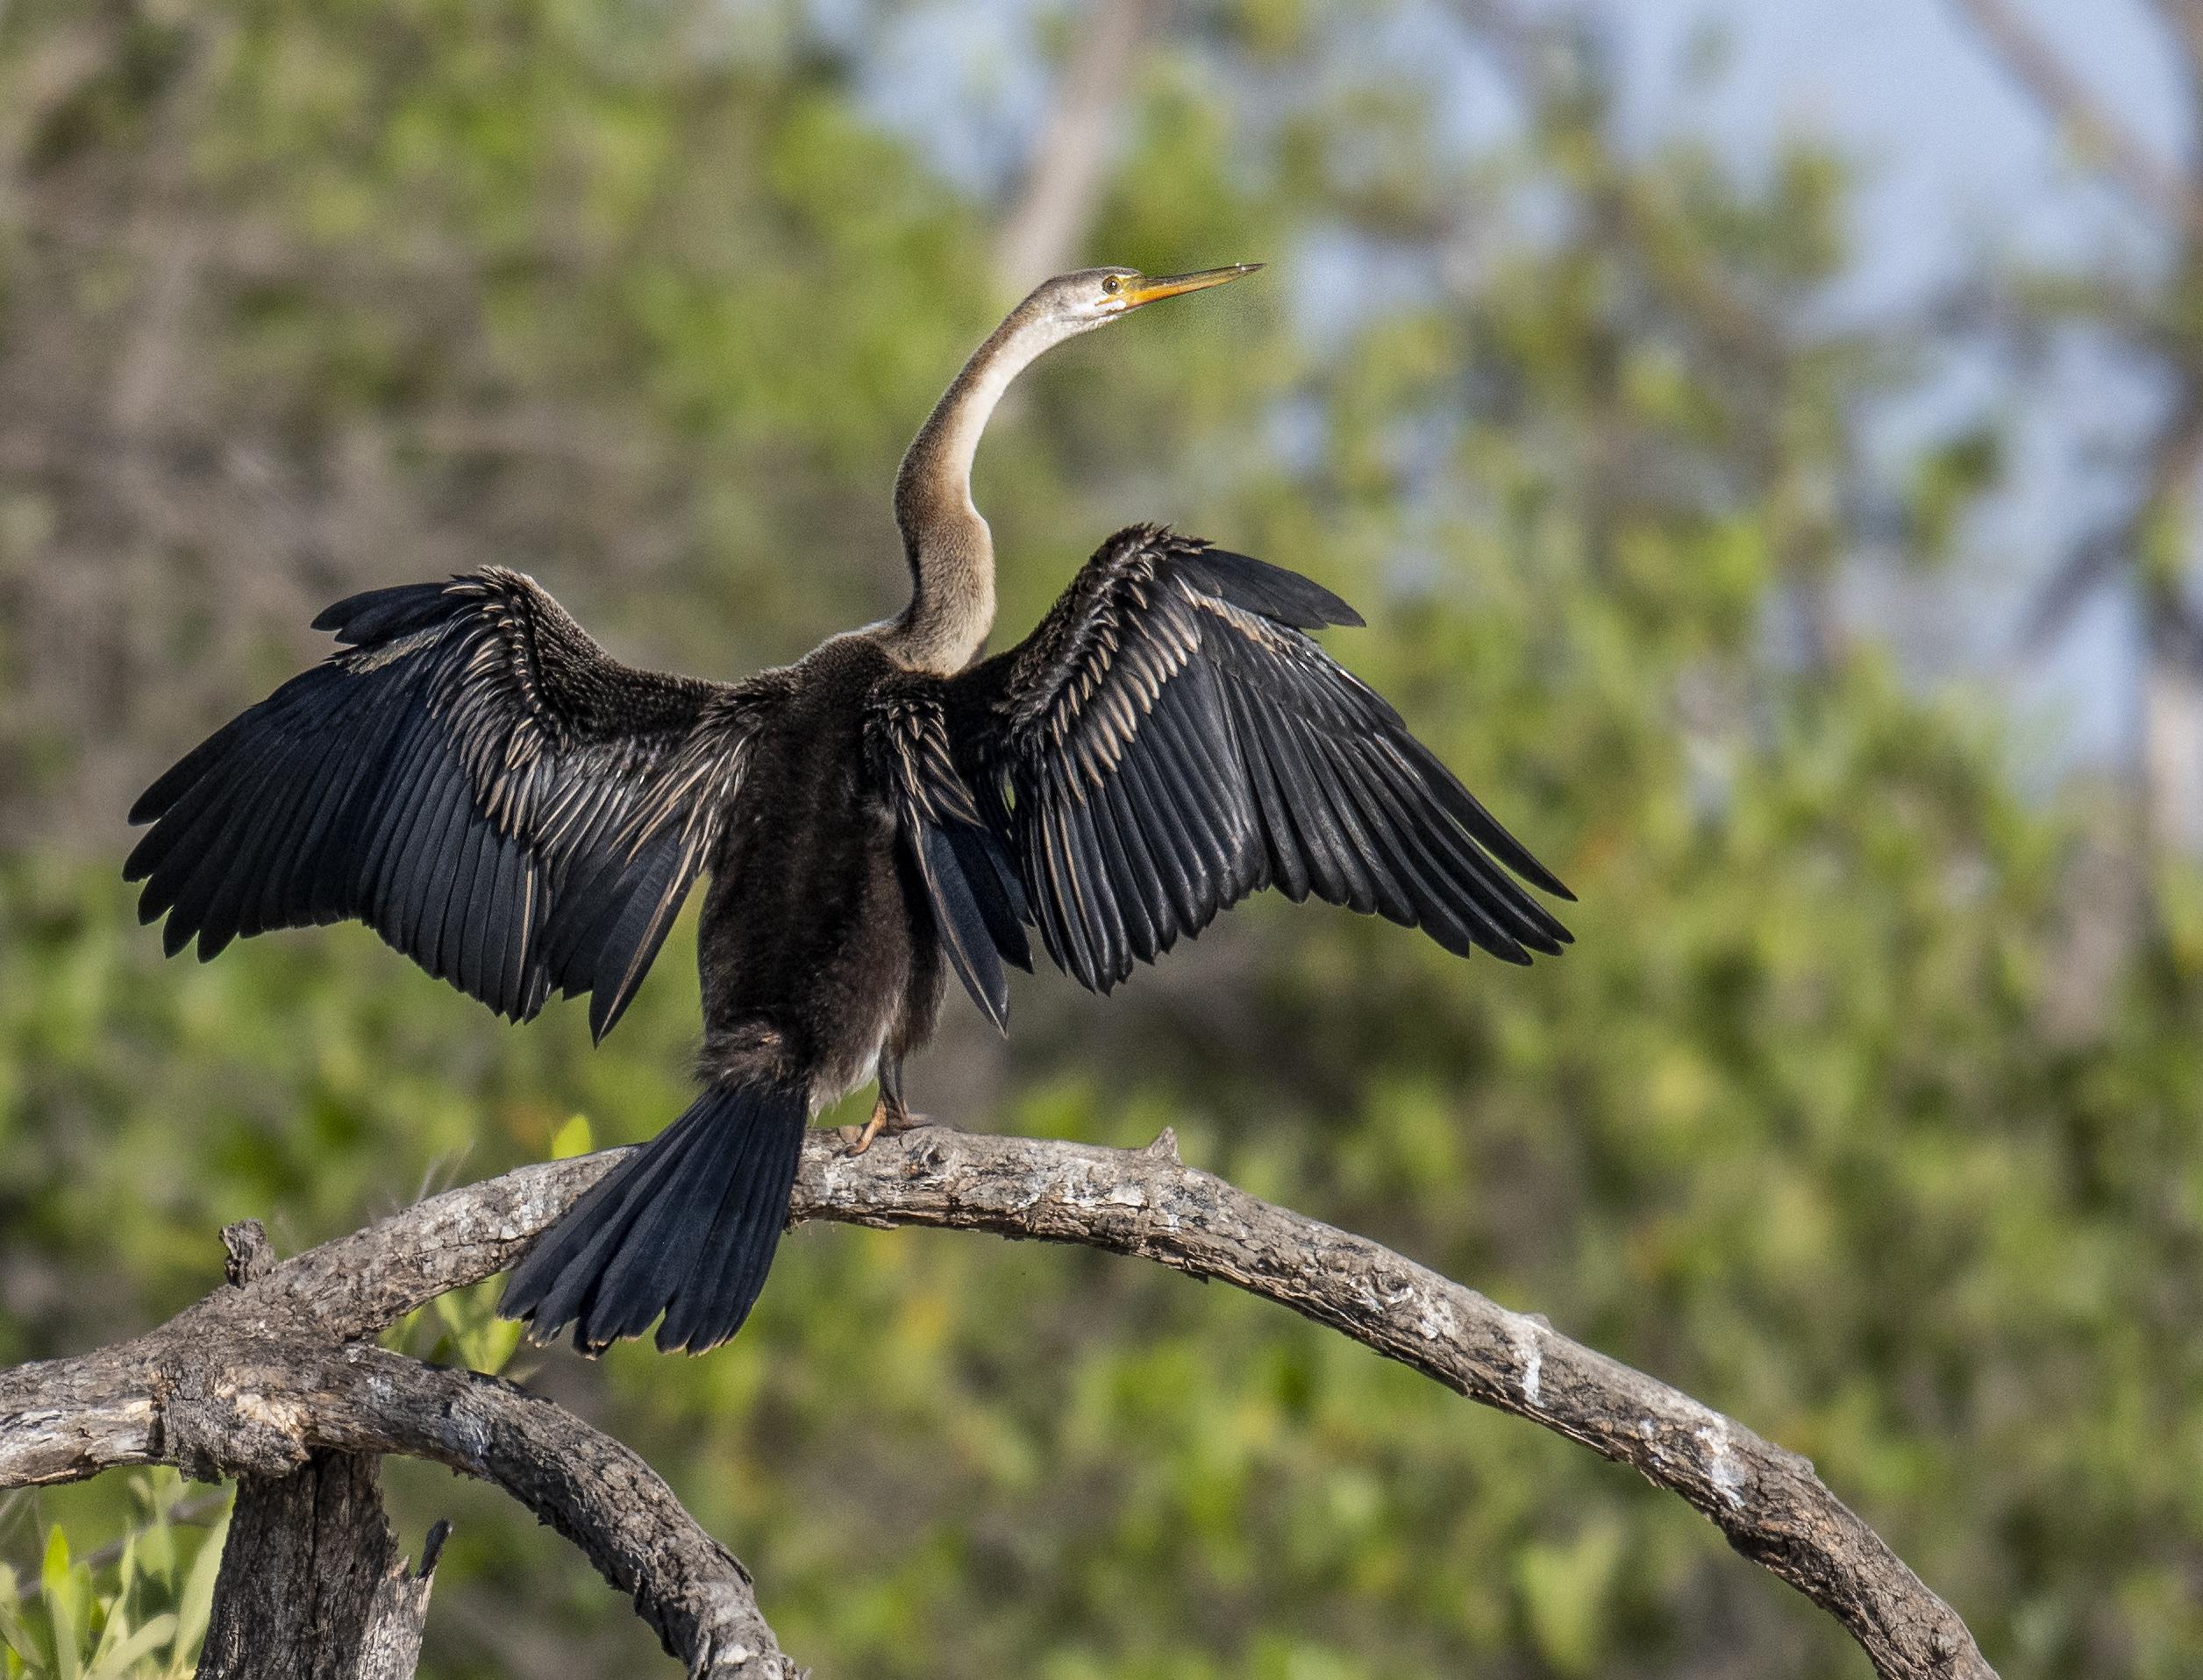 Afrikansk ormhalsfågel